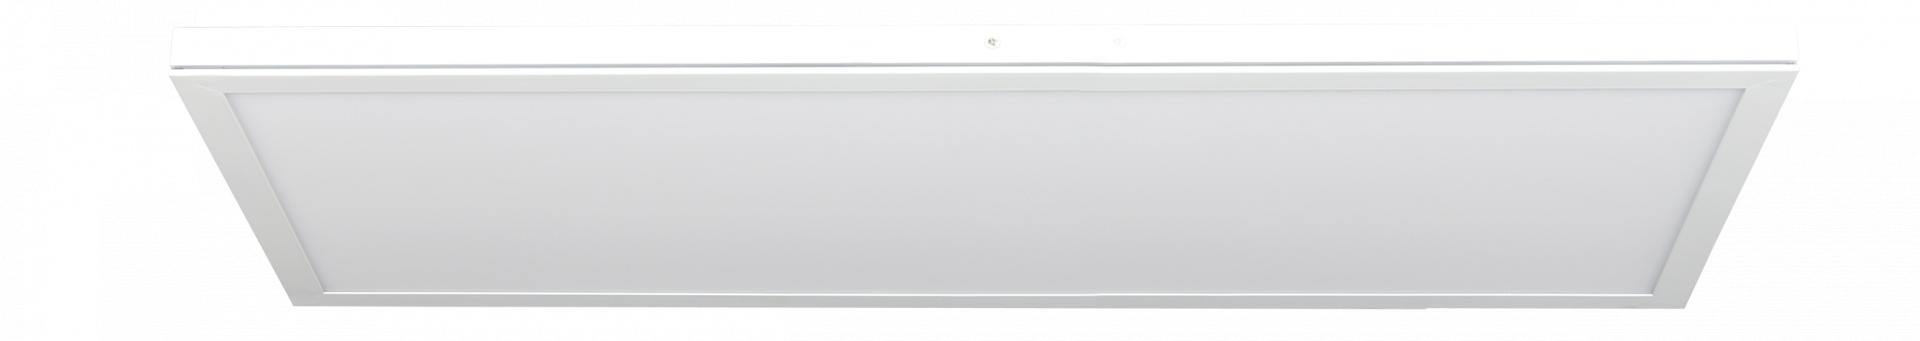 Panel Led Superficie Tolstoi 90x30 Blanco